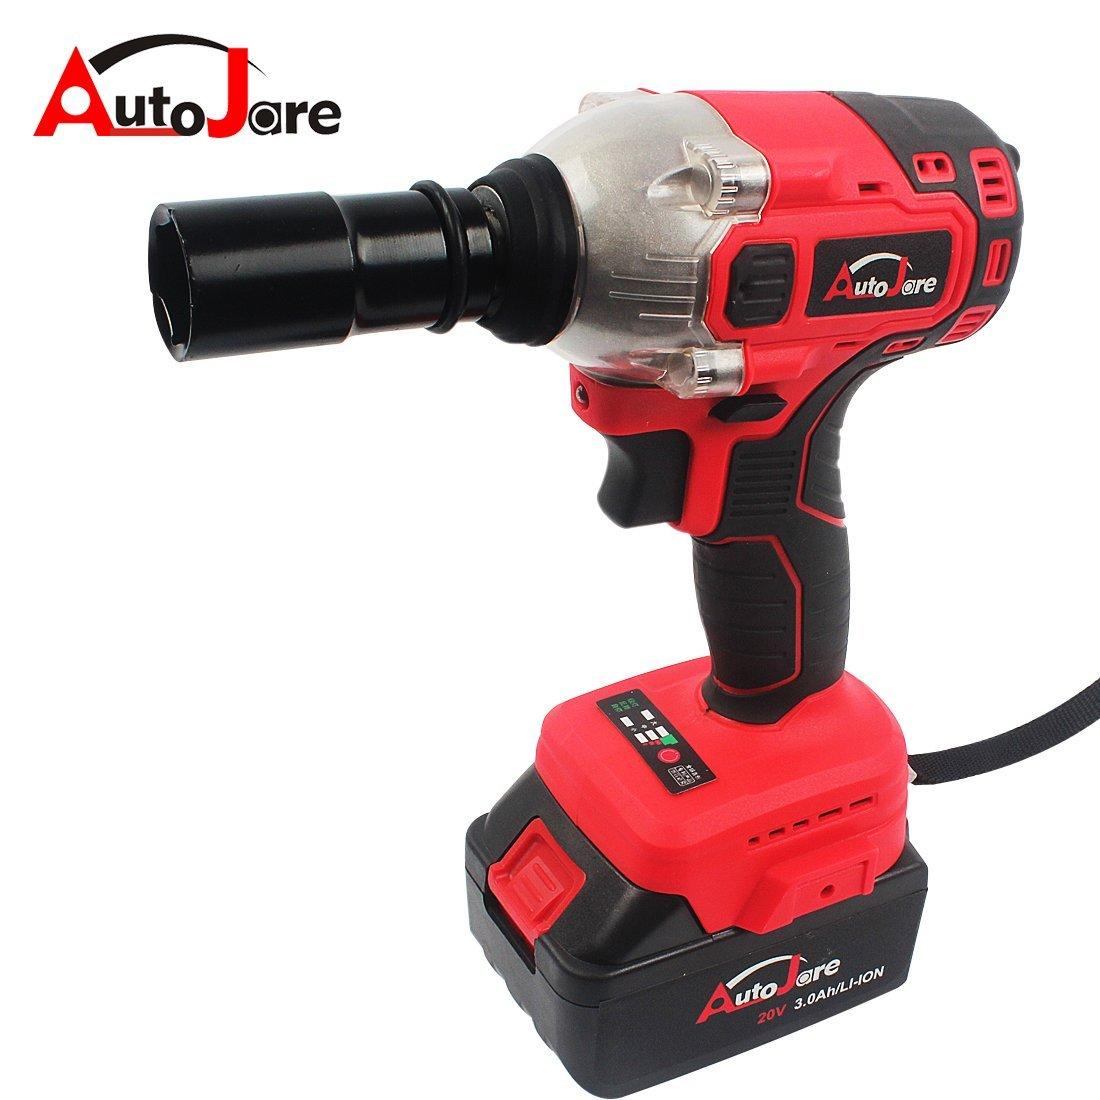 Autojare 18V / 20V Brushless Electric Cordless Impact Wrench Driver HEAVY DUTY 1/2'' Chunk